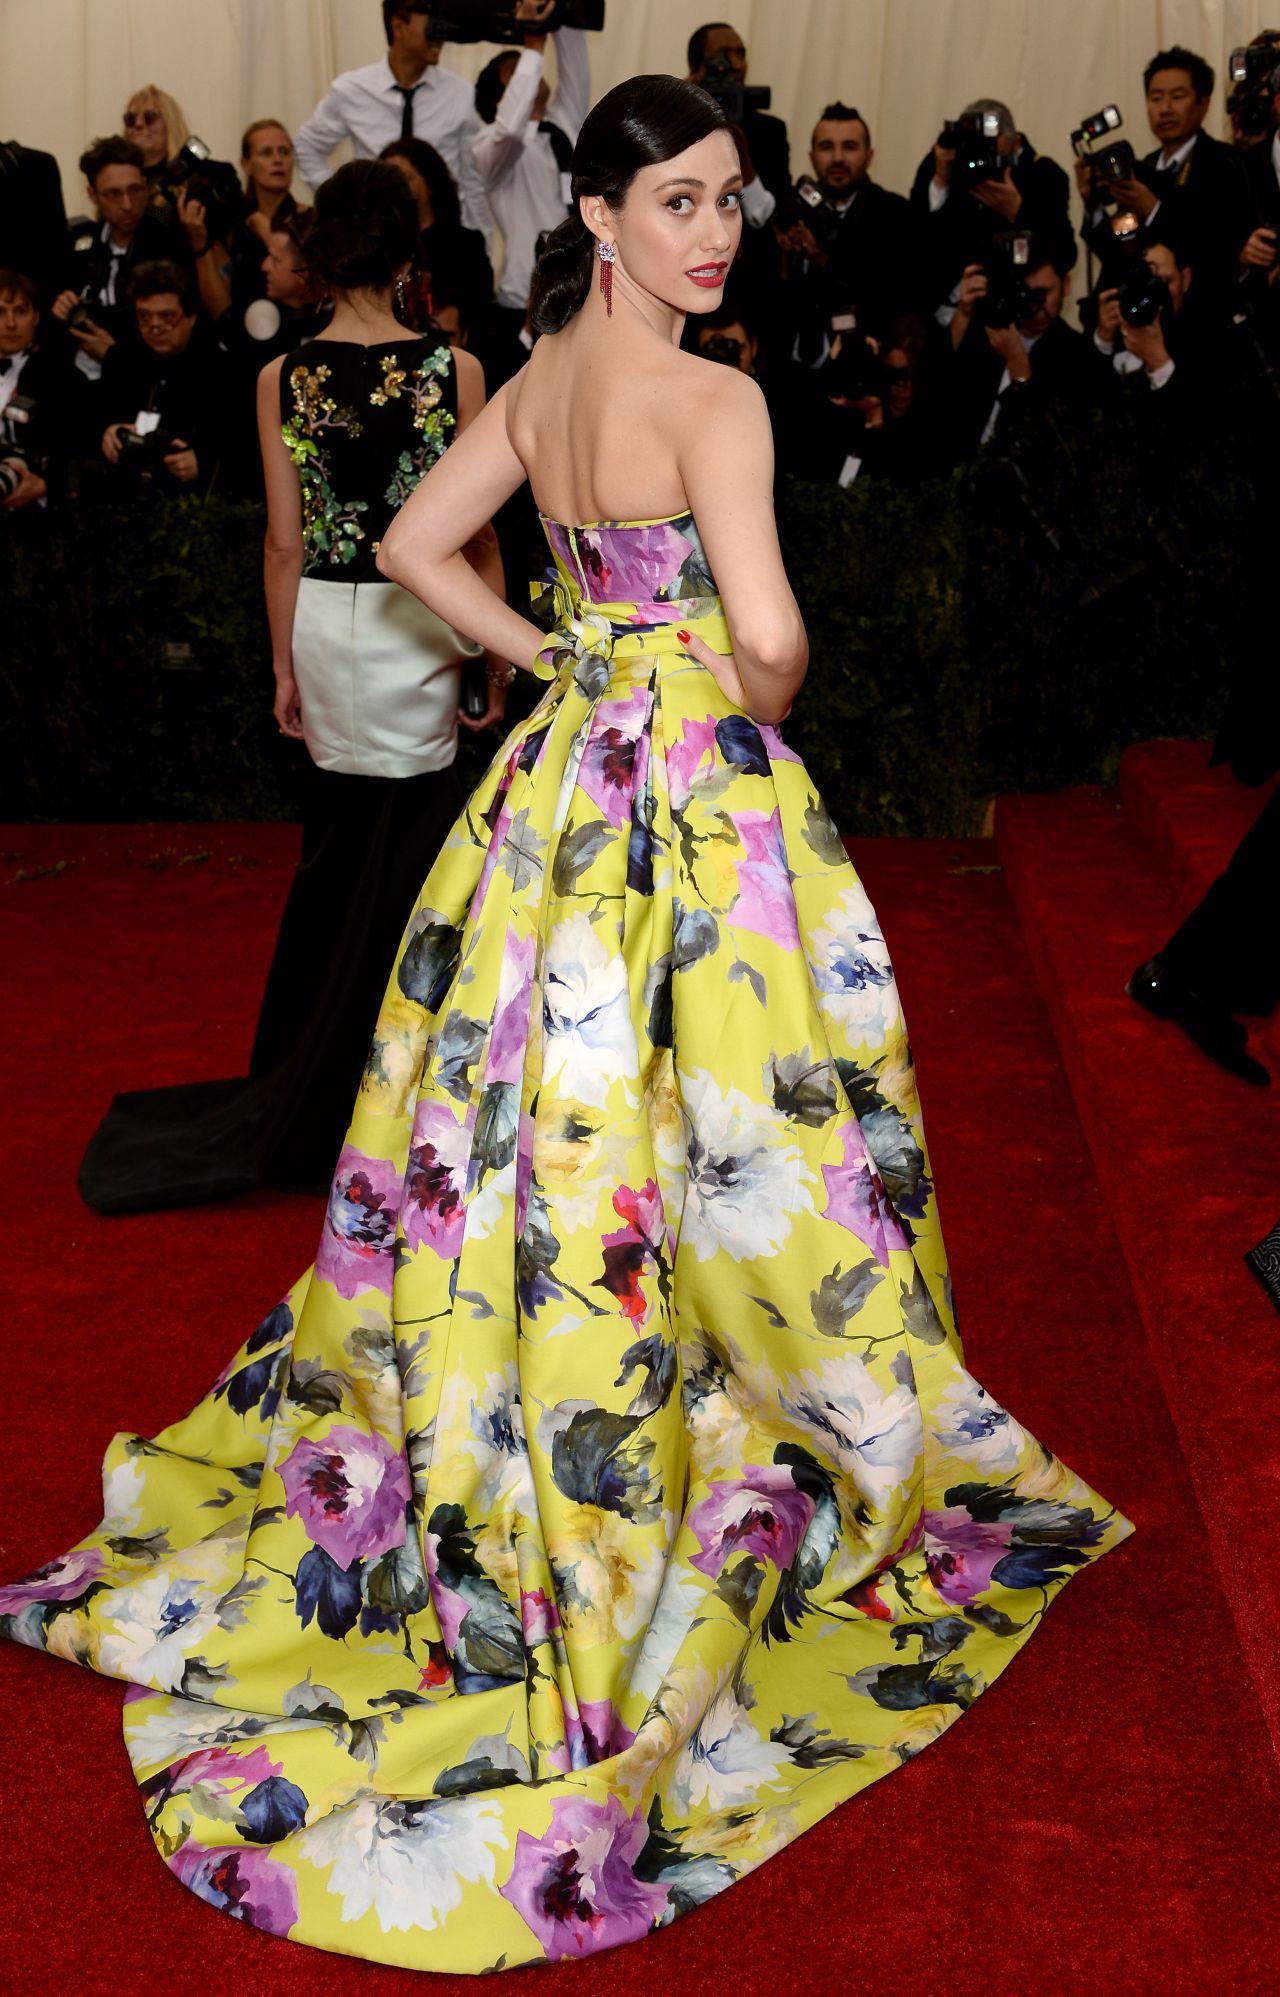 Emmy Rossum Wearing Carolina Herrera Strapless Ball Gown 2014 Met